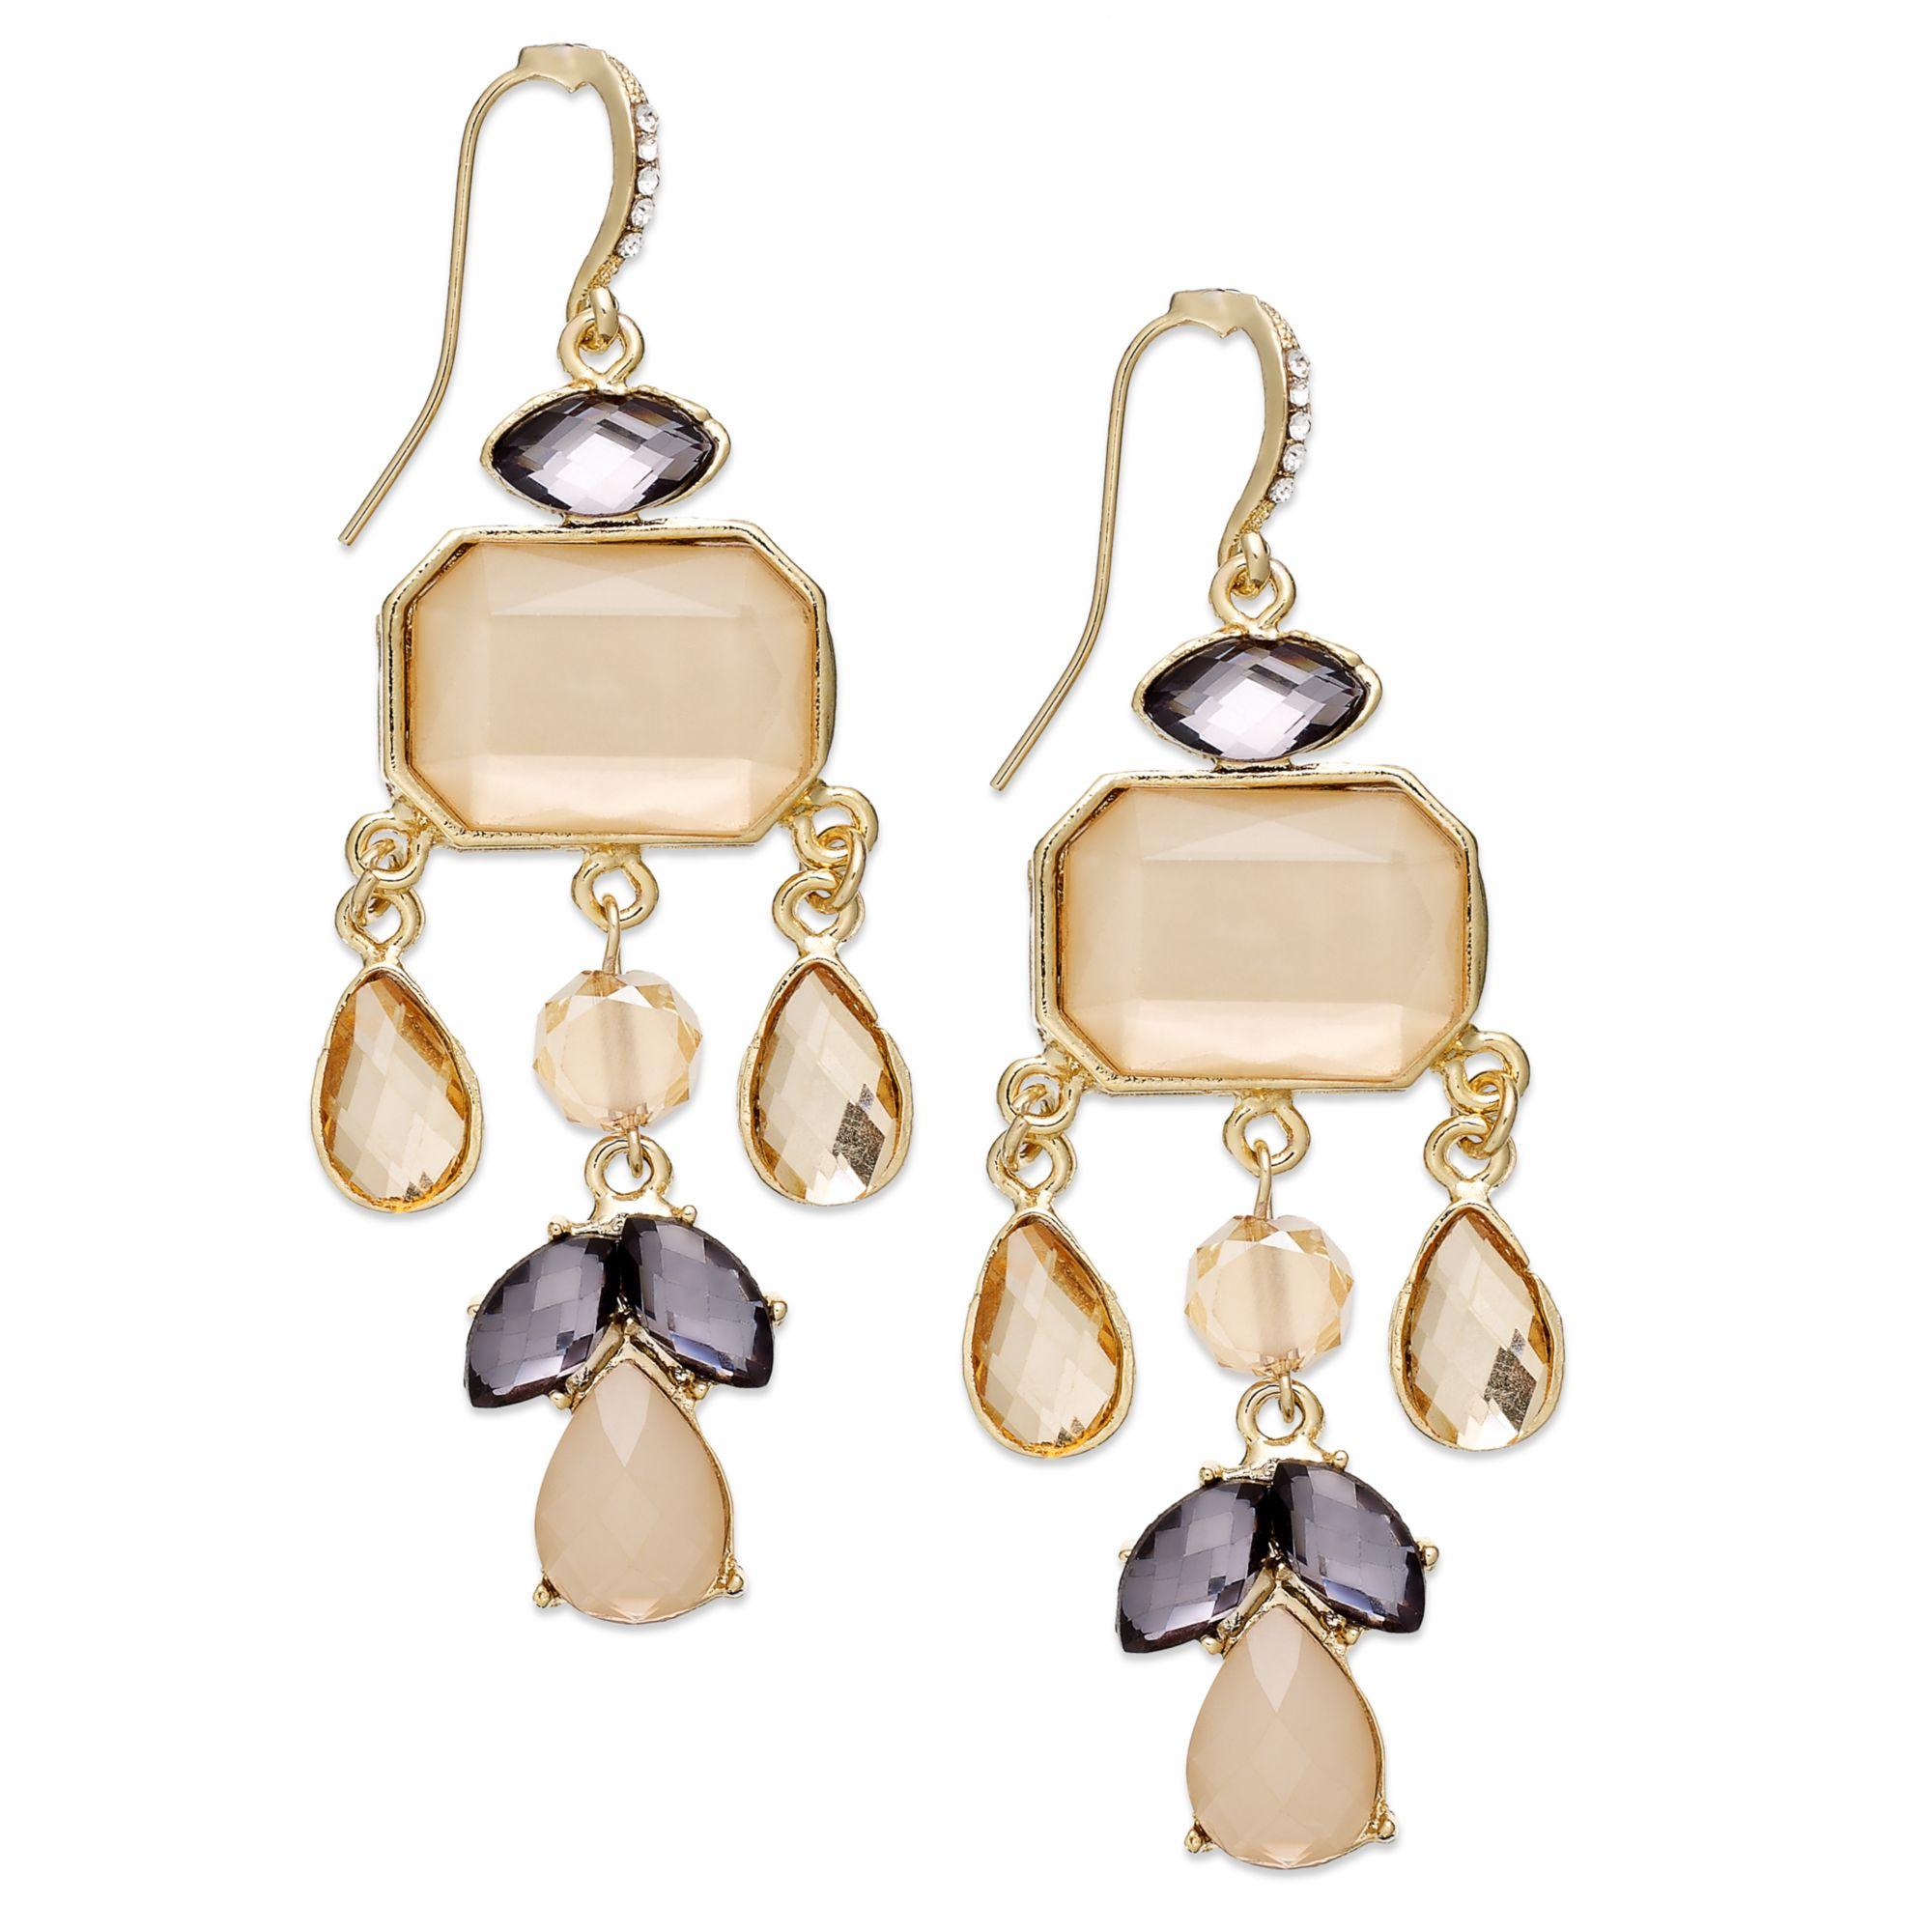 Inc international concepts Goldtone Blush and Black Diamond Stone – Black Diamond Chandelier Earrings